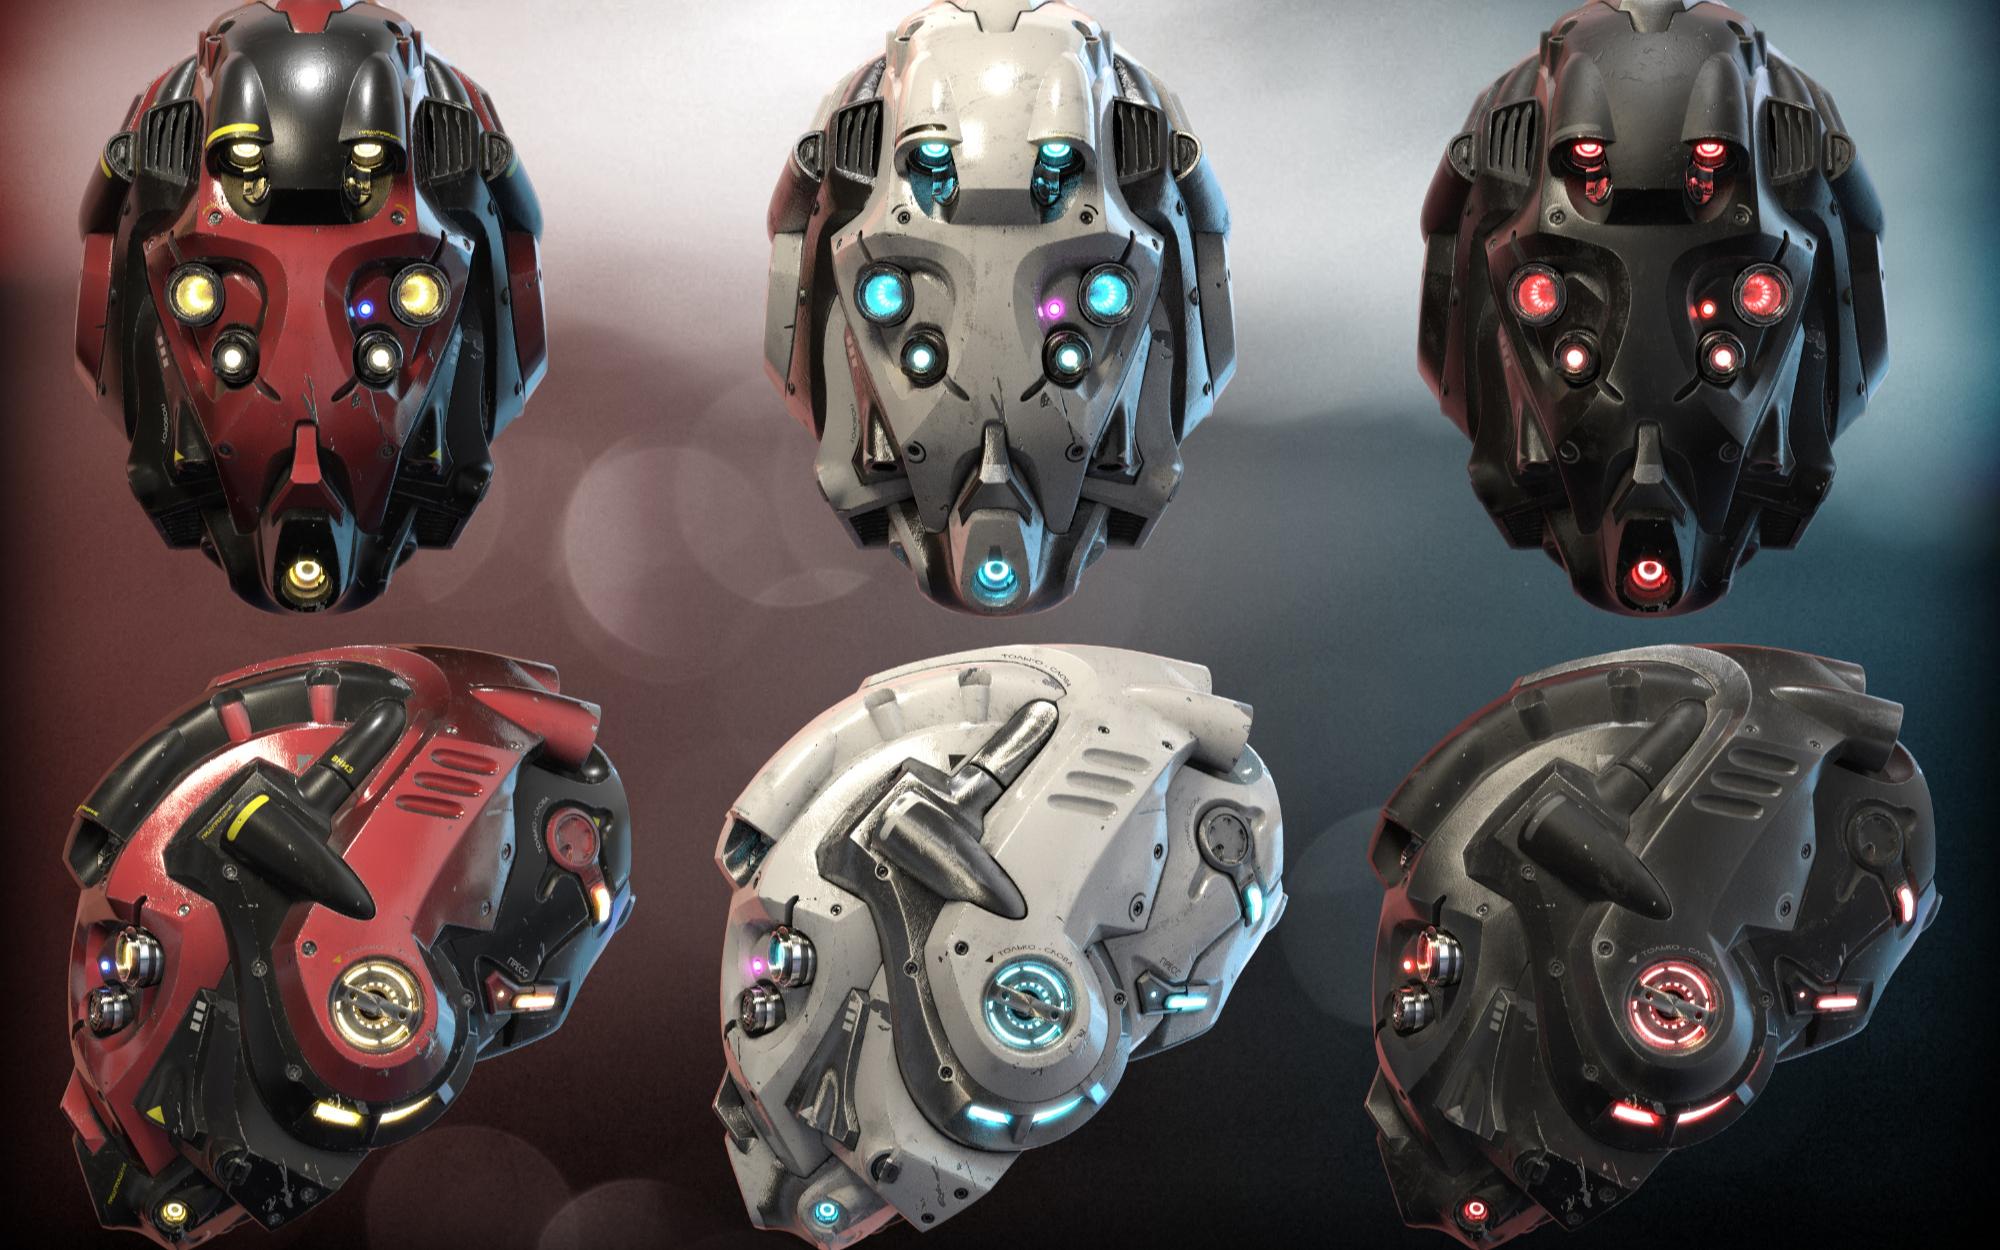 【Blender】Kent Trammell《太空科幻头盔模型制作》(中英双字)